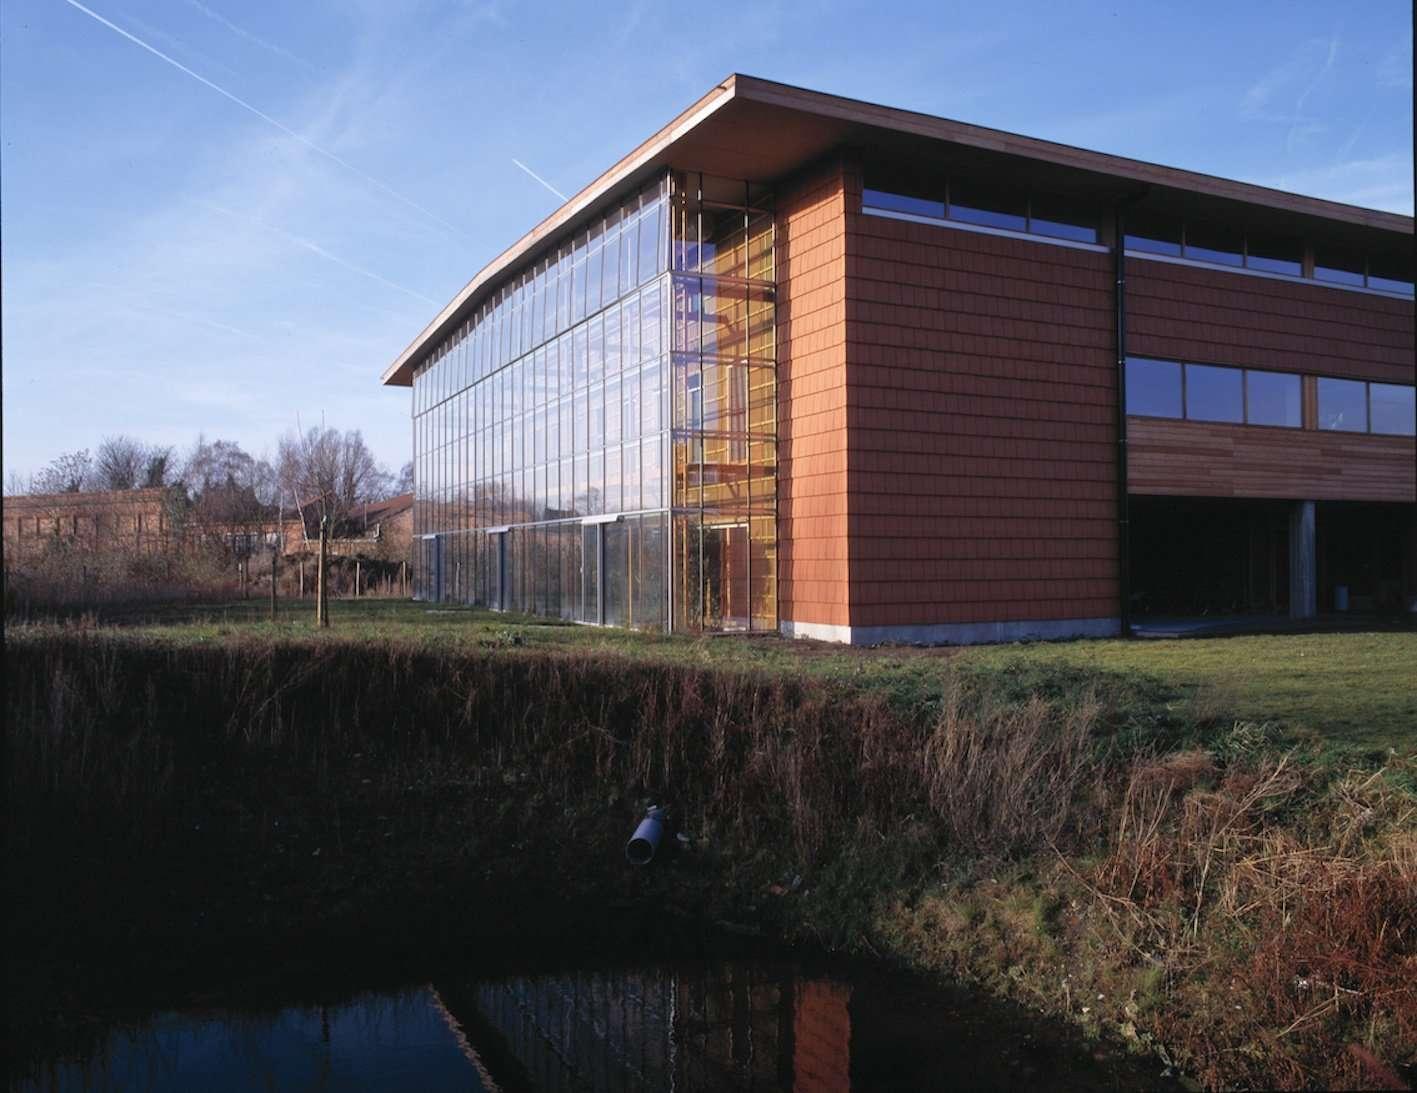 oxfam sint-amandsberg <span>1999, gent, kantoren</span>